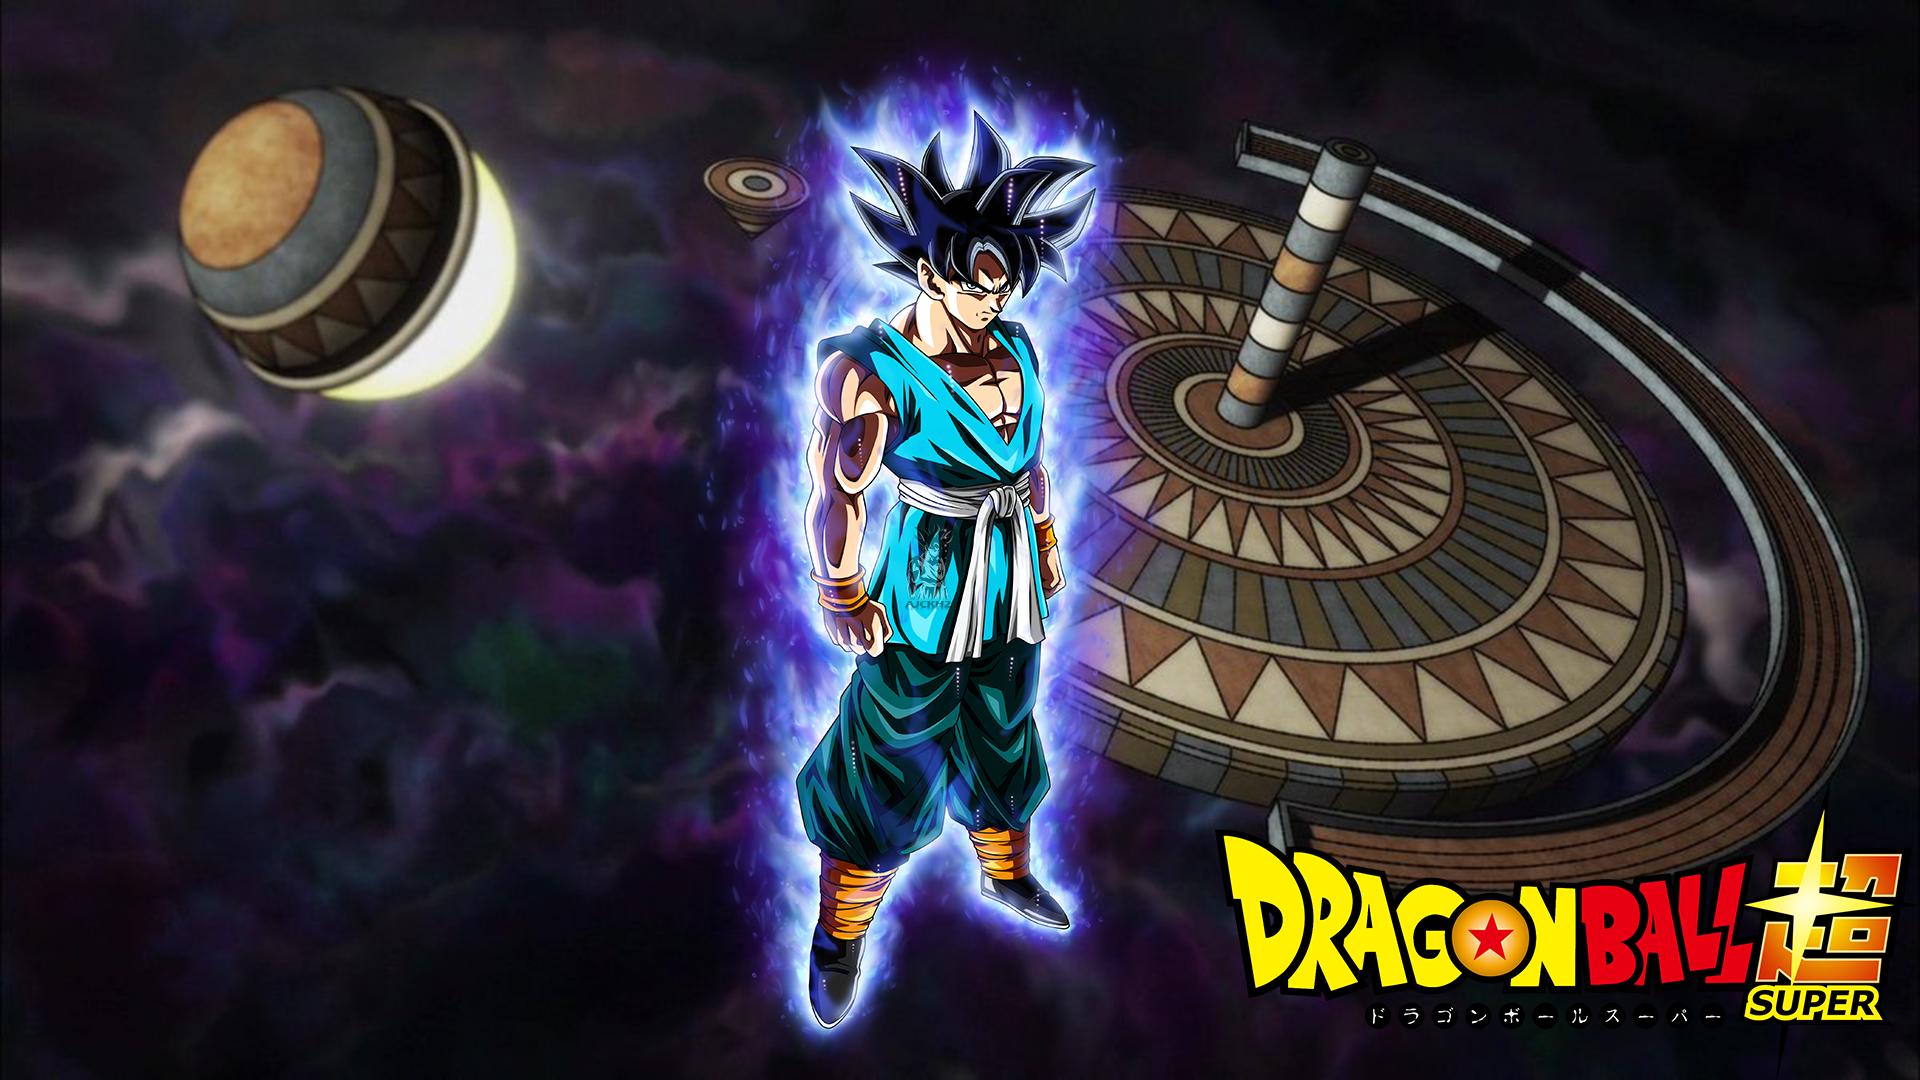 Goku Ultra Instinct DBS Wallpaper by ajckh2 1920x1080